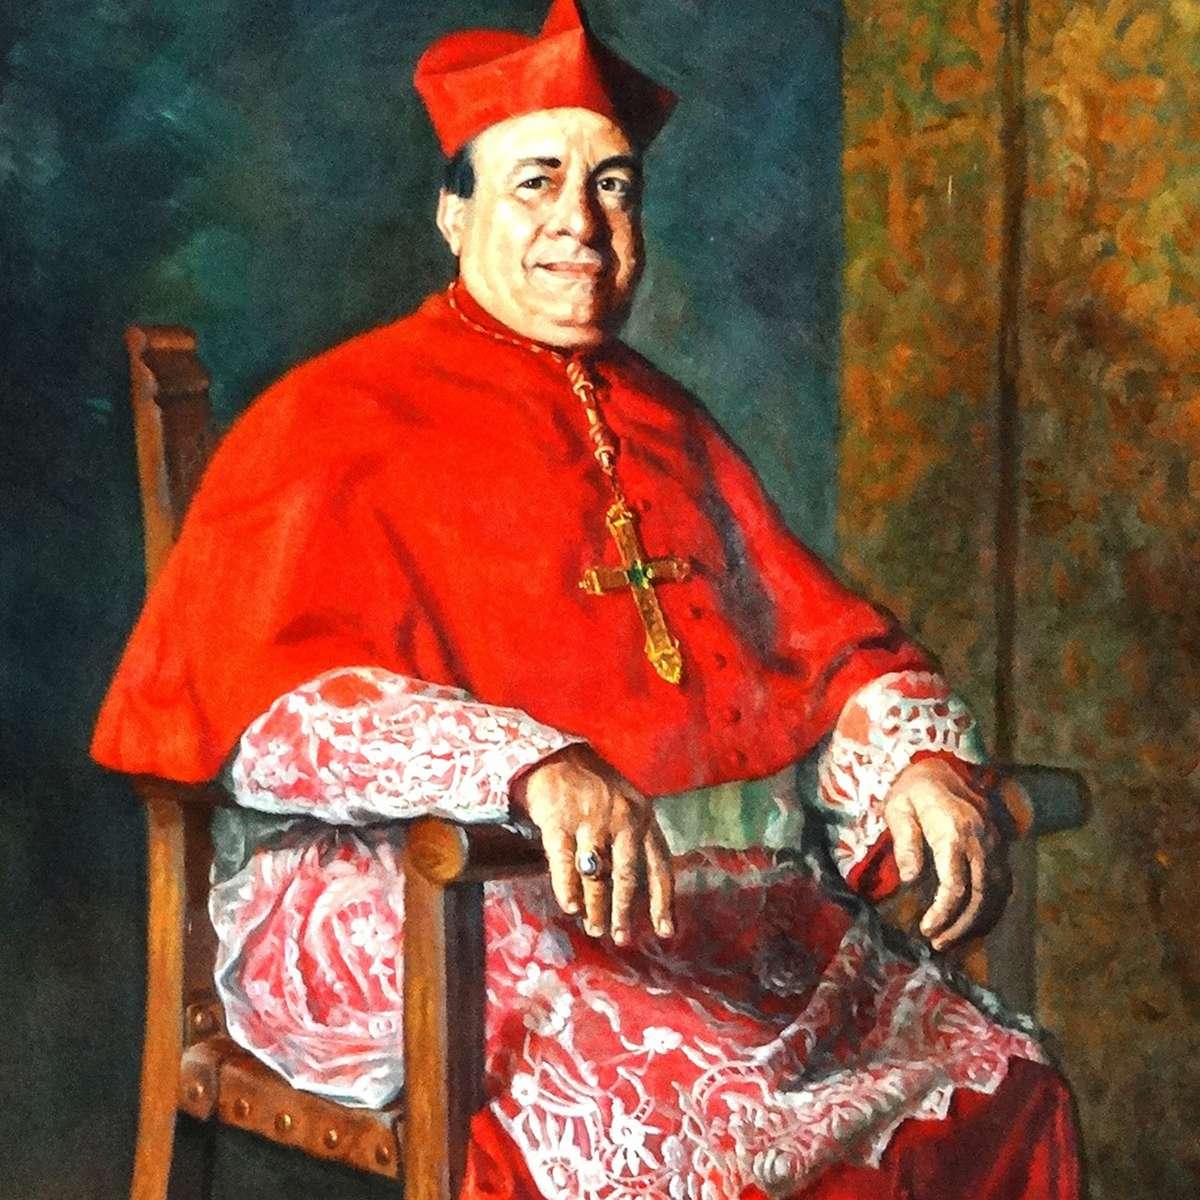 Cardenal José Alí Lebrún Moratinos